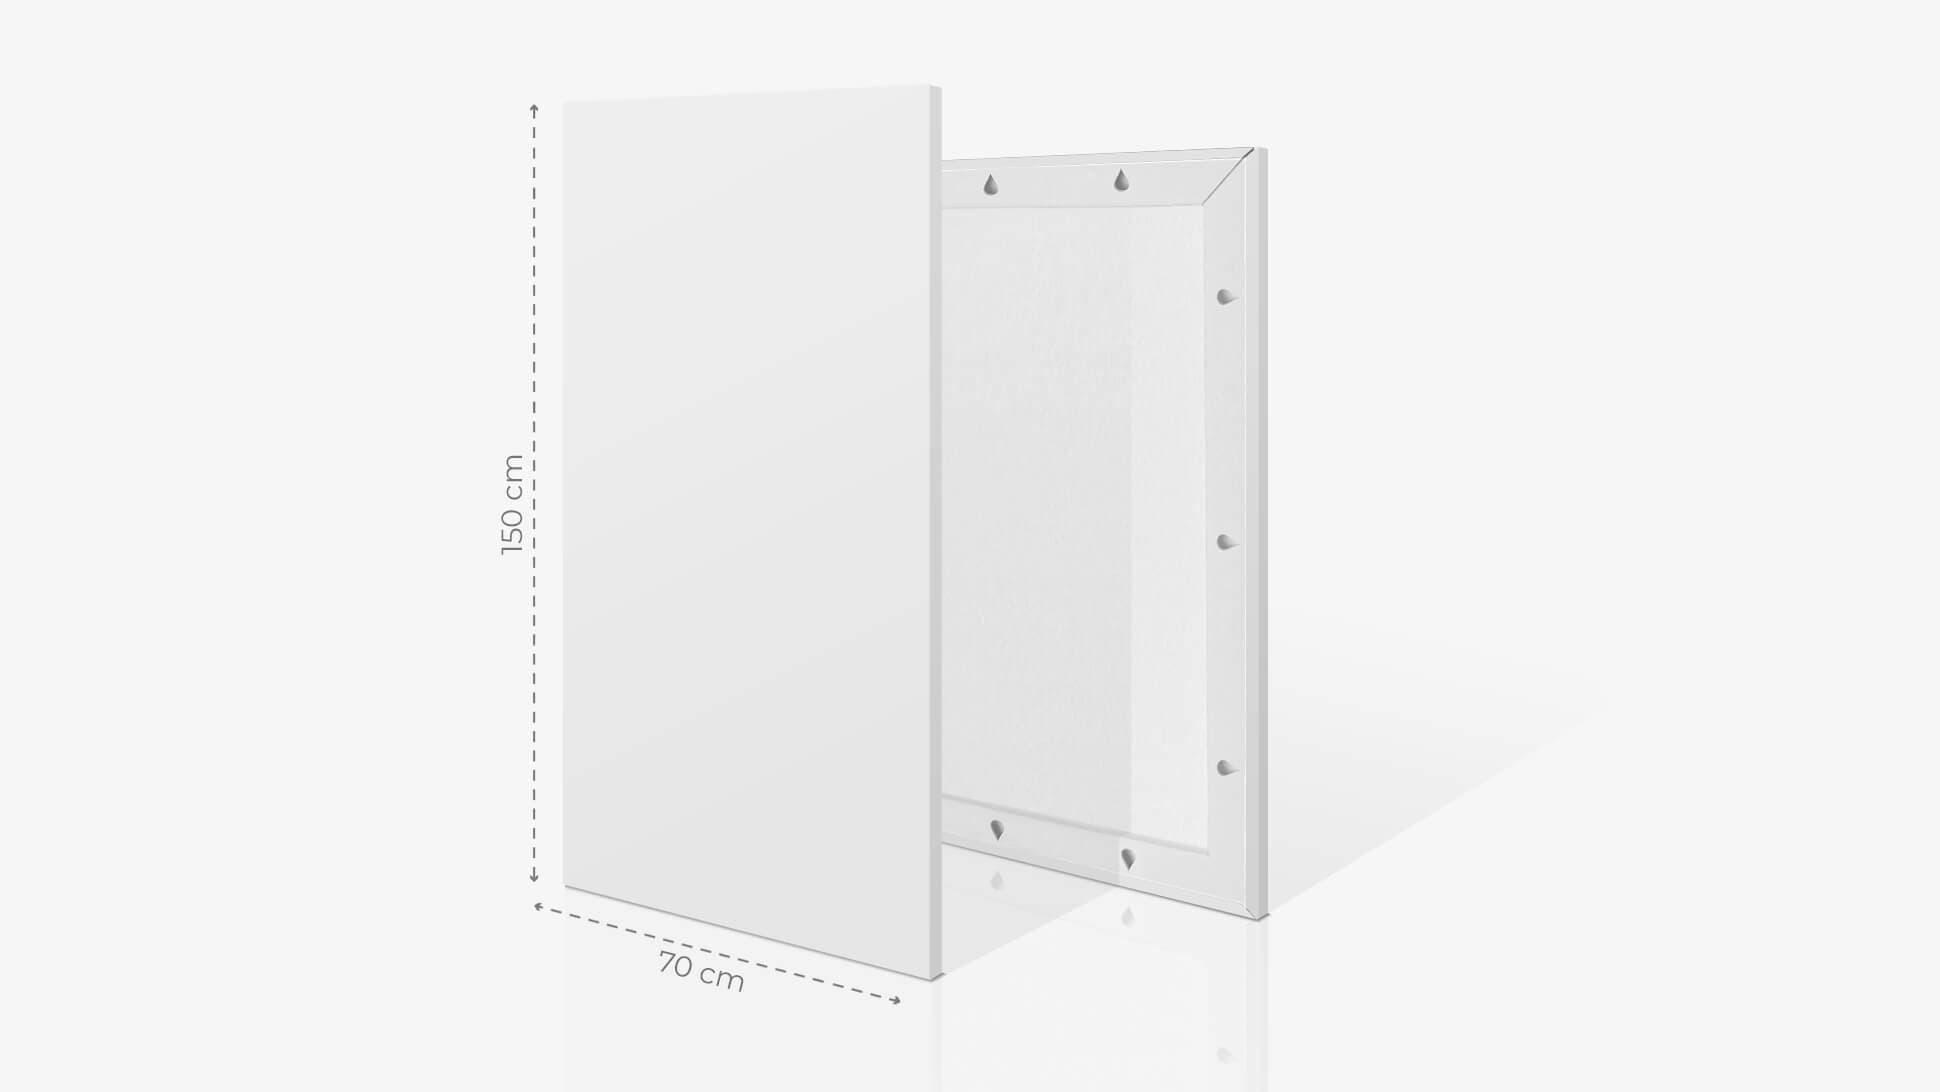 Fotoquadro 70x150 cm | tictac.it